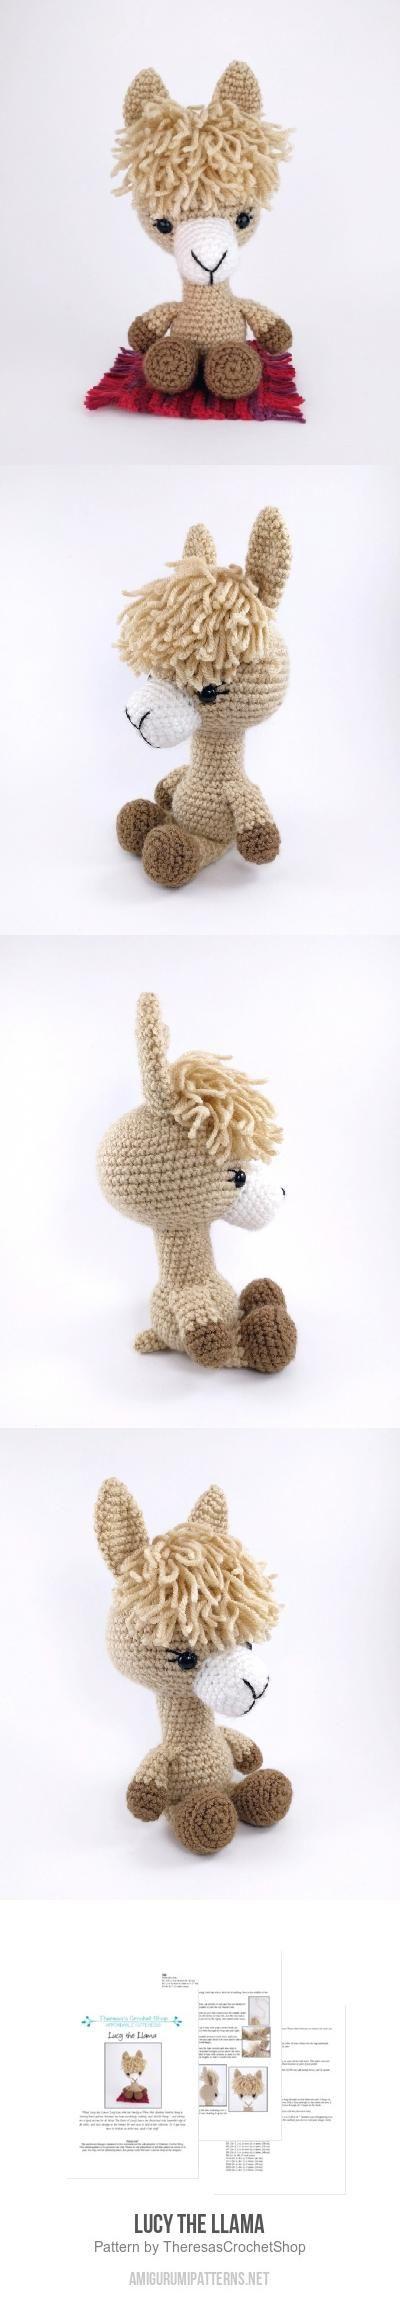 59 best Amigurumi images on Pinterest | Amigurumi patterns, Crochet ...